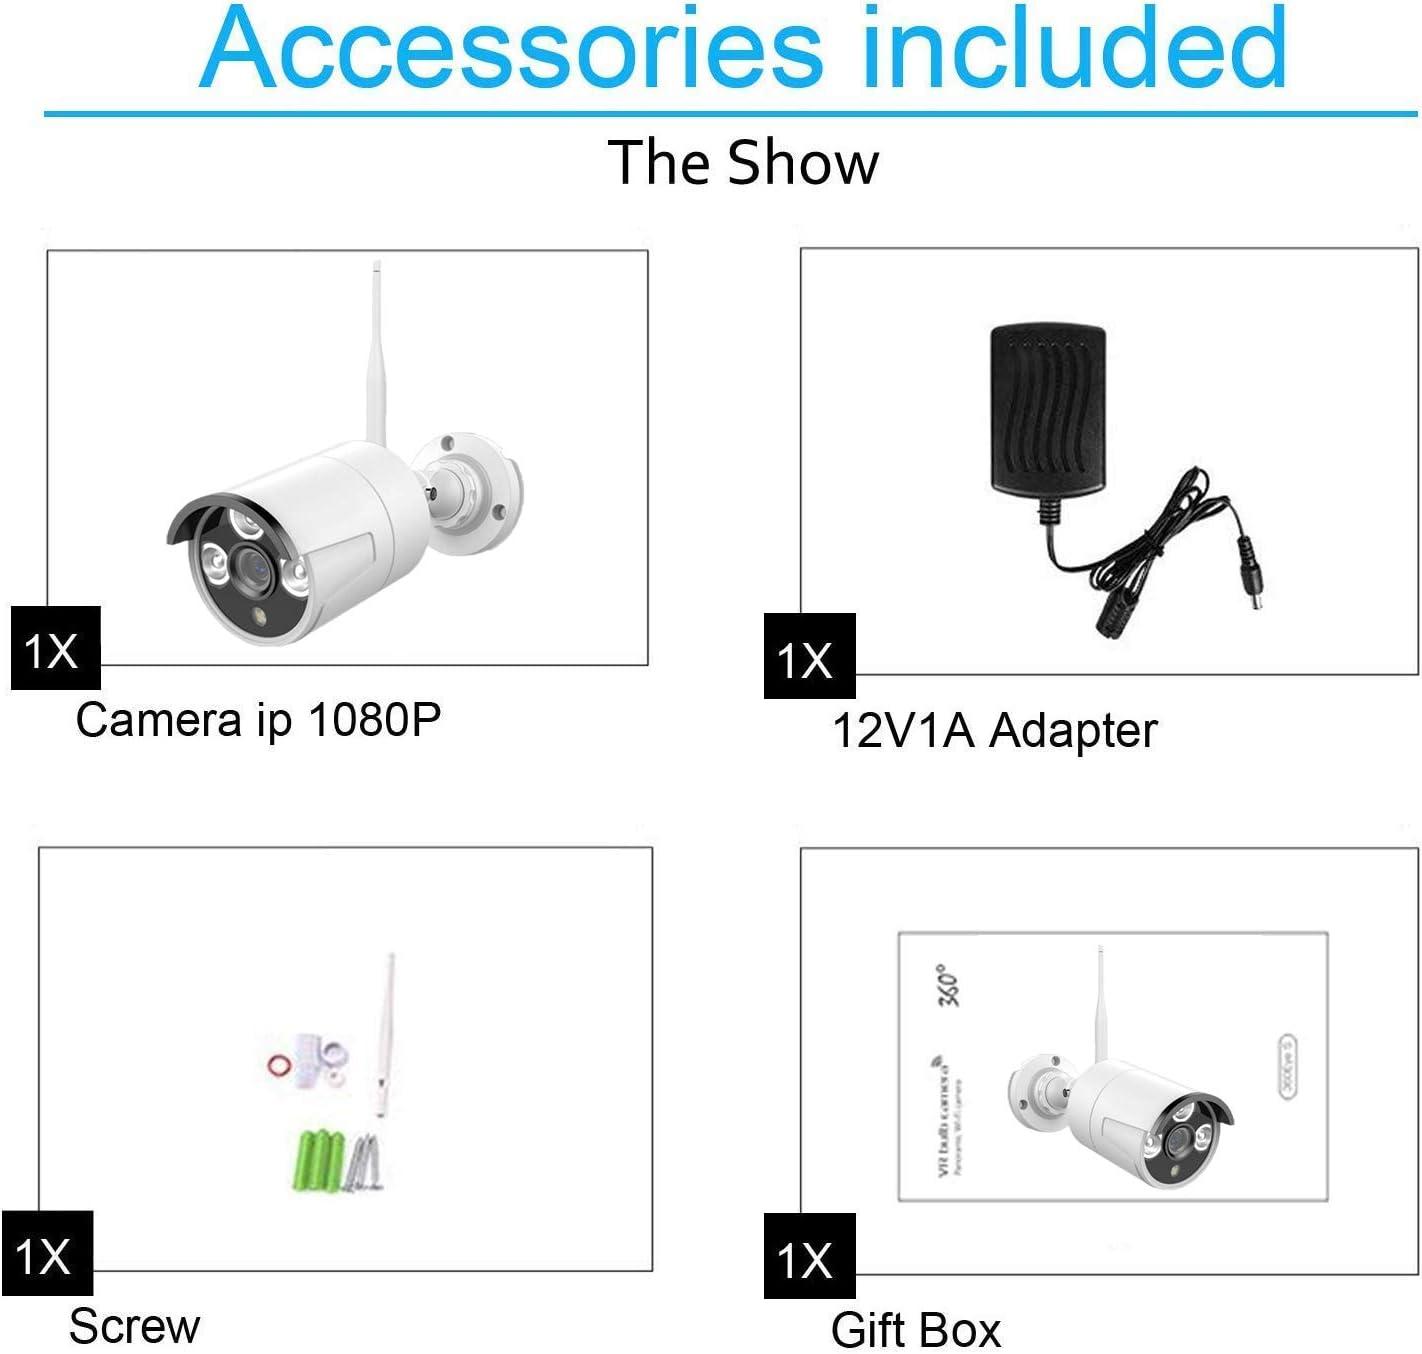 Antena Enchufe Est/ándar Europeo Blanco Cable de Alimentaci/ón 3m C/ámara IP 1080P para Kit Videovigilancia REIGY 5dbi IP66 a Prueba de Agua